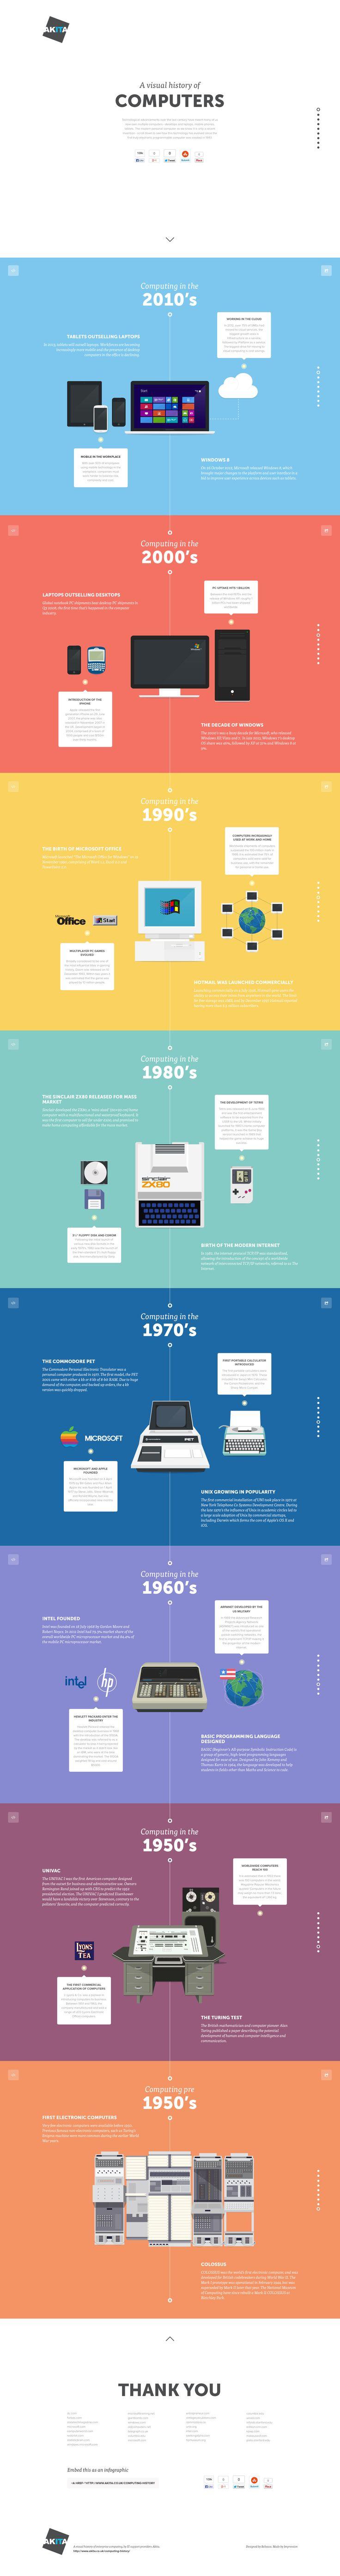 7 decades of digital computing #Infographic